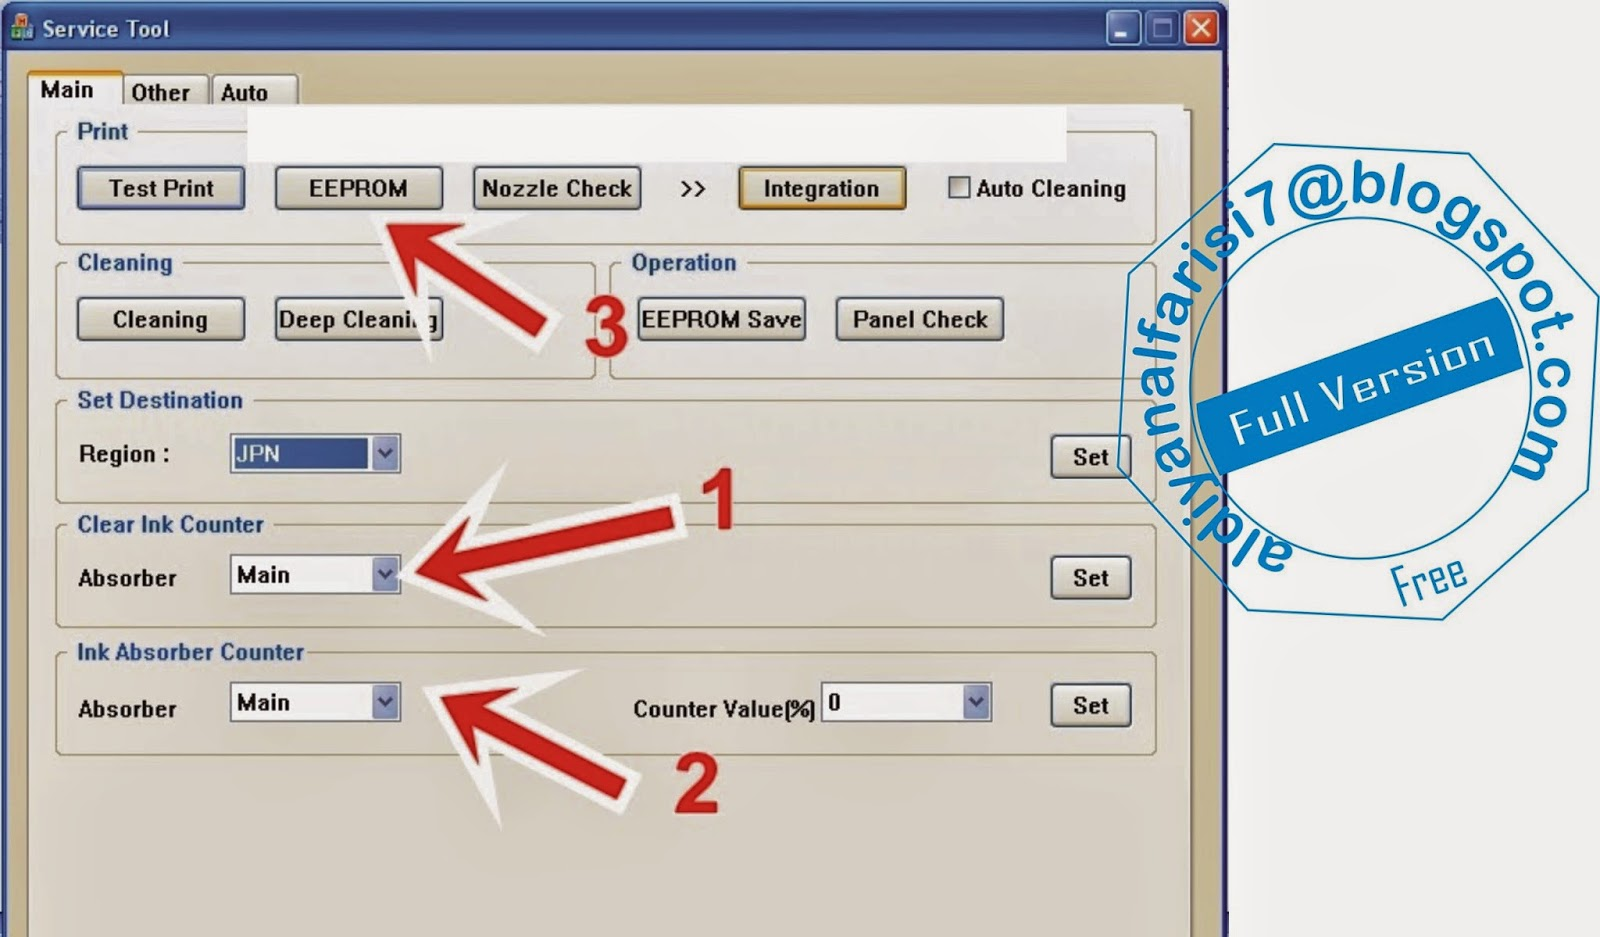 Resetter Tool V3400 | resetter canon mp287 free download